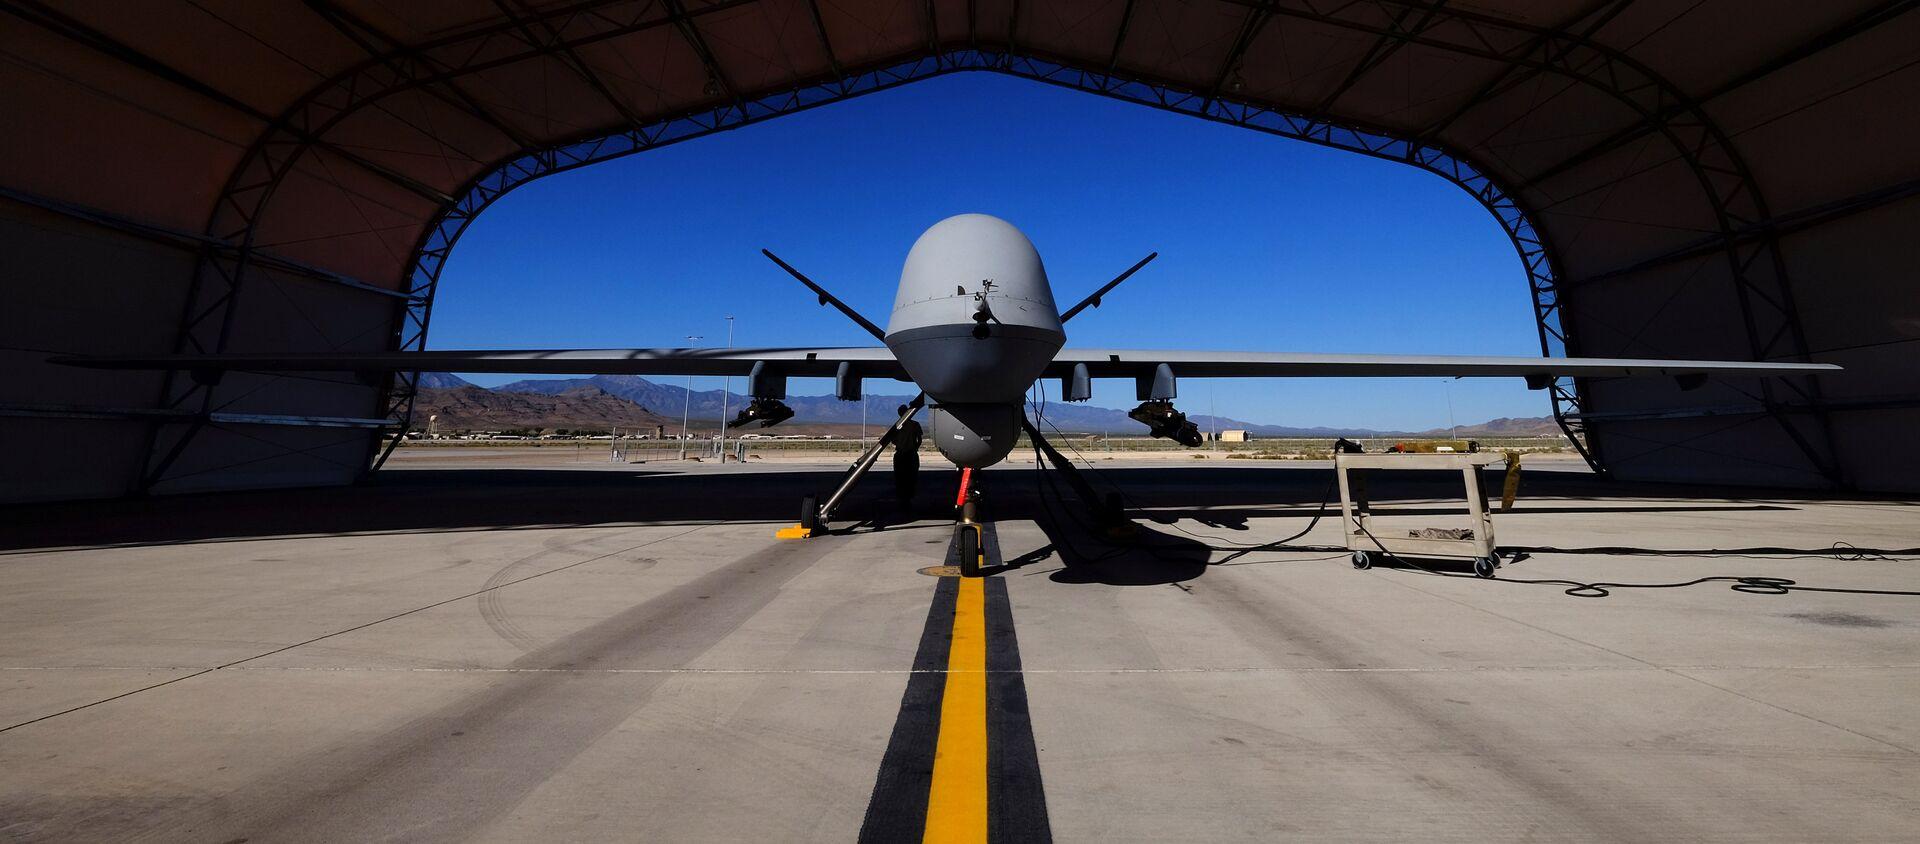 A U.S. Air Force MQ-9 Reaper drone sits in a hanger at Creech Air Force Base - Sputnik Mundo, 1920, 05.01.2021